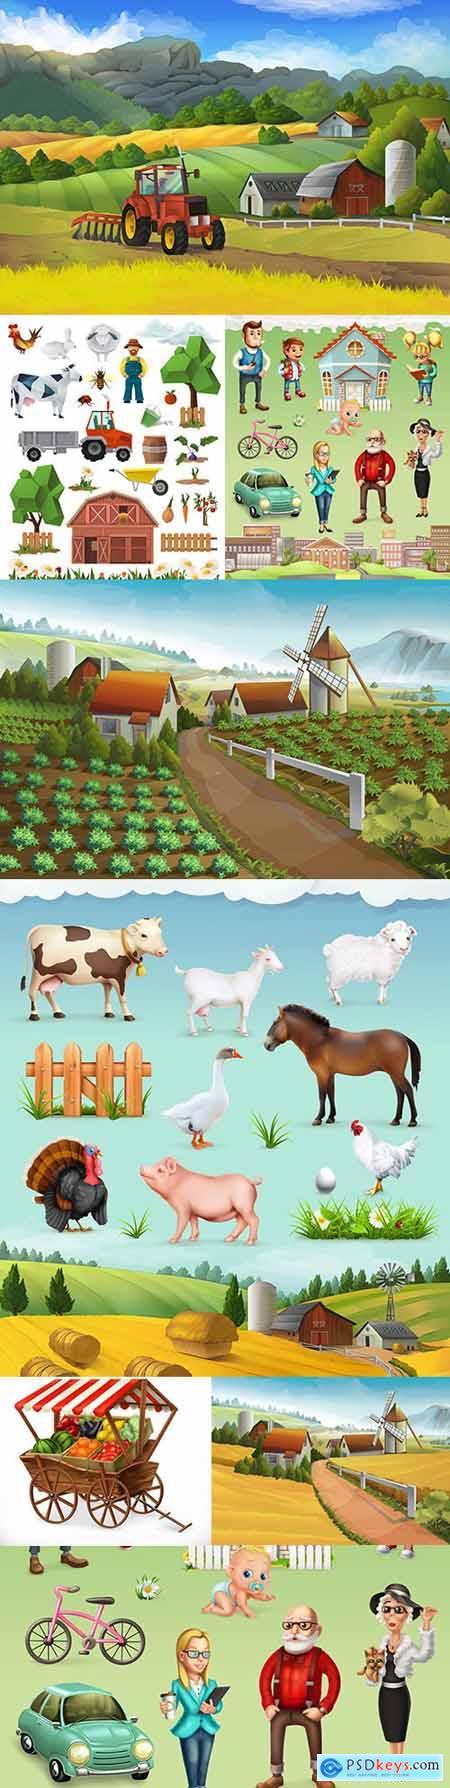 Farm and animal rural landscape vector illustrations